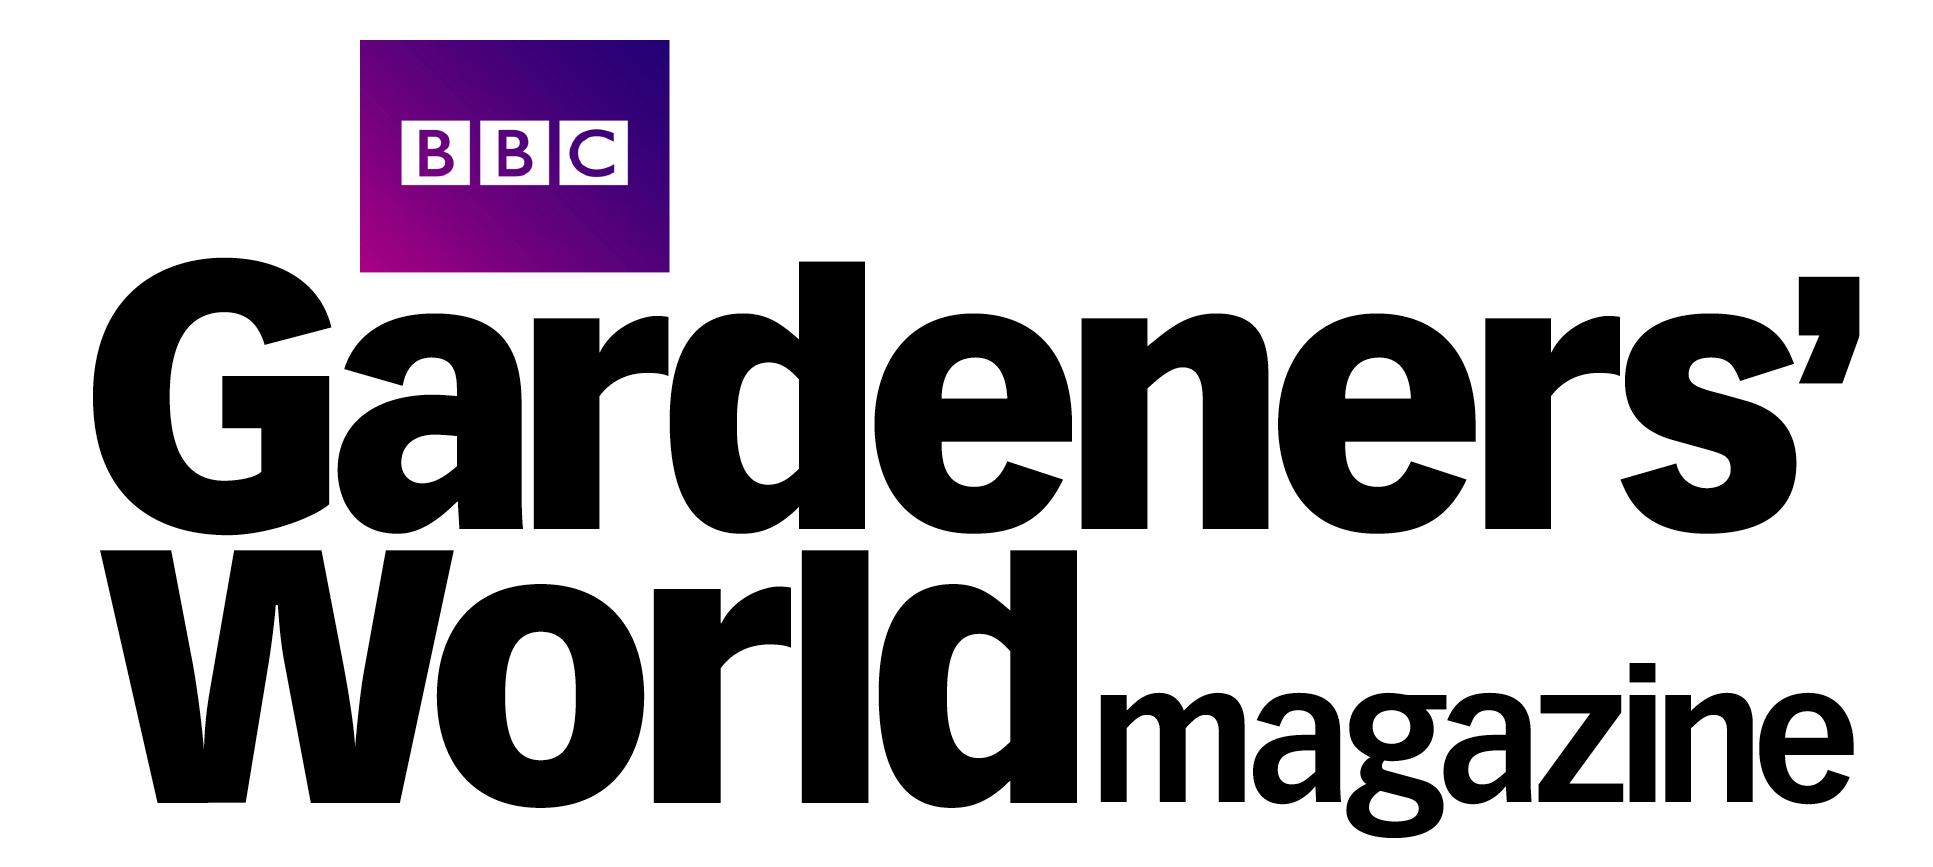 Gardeners World Voucher Codes Discount Codes Amp Deals Money Saving Expert